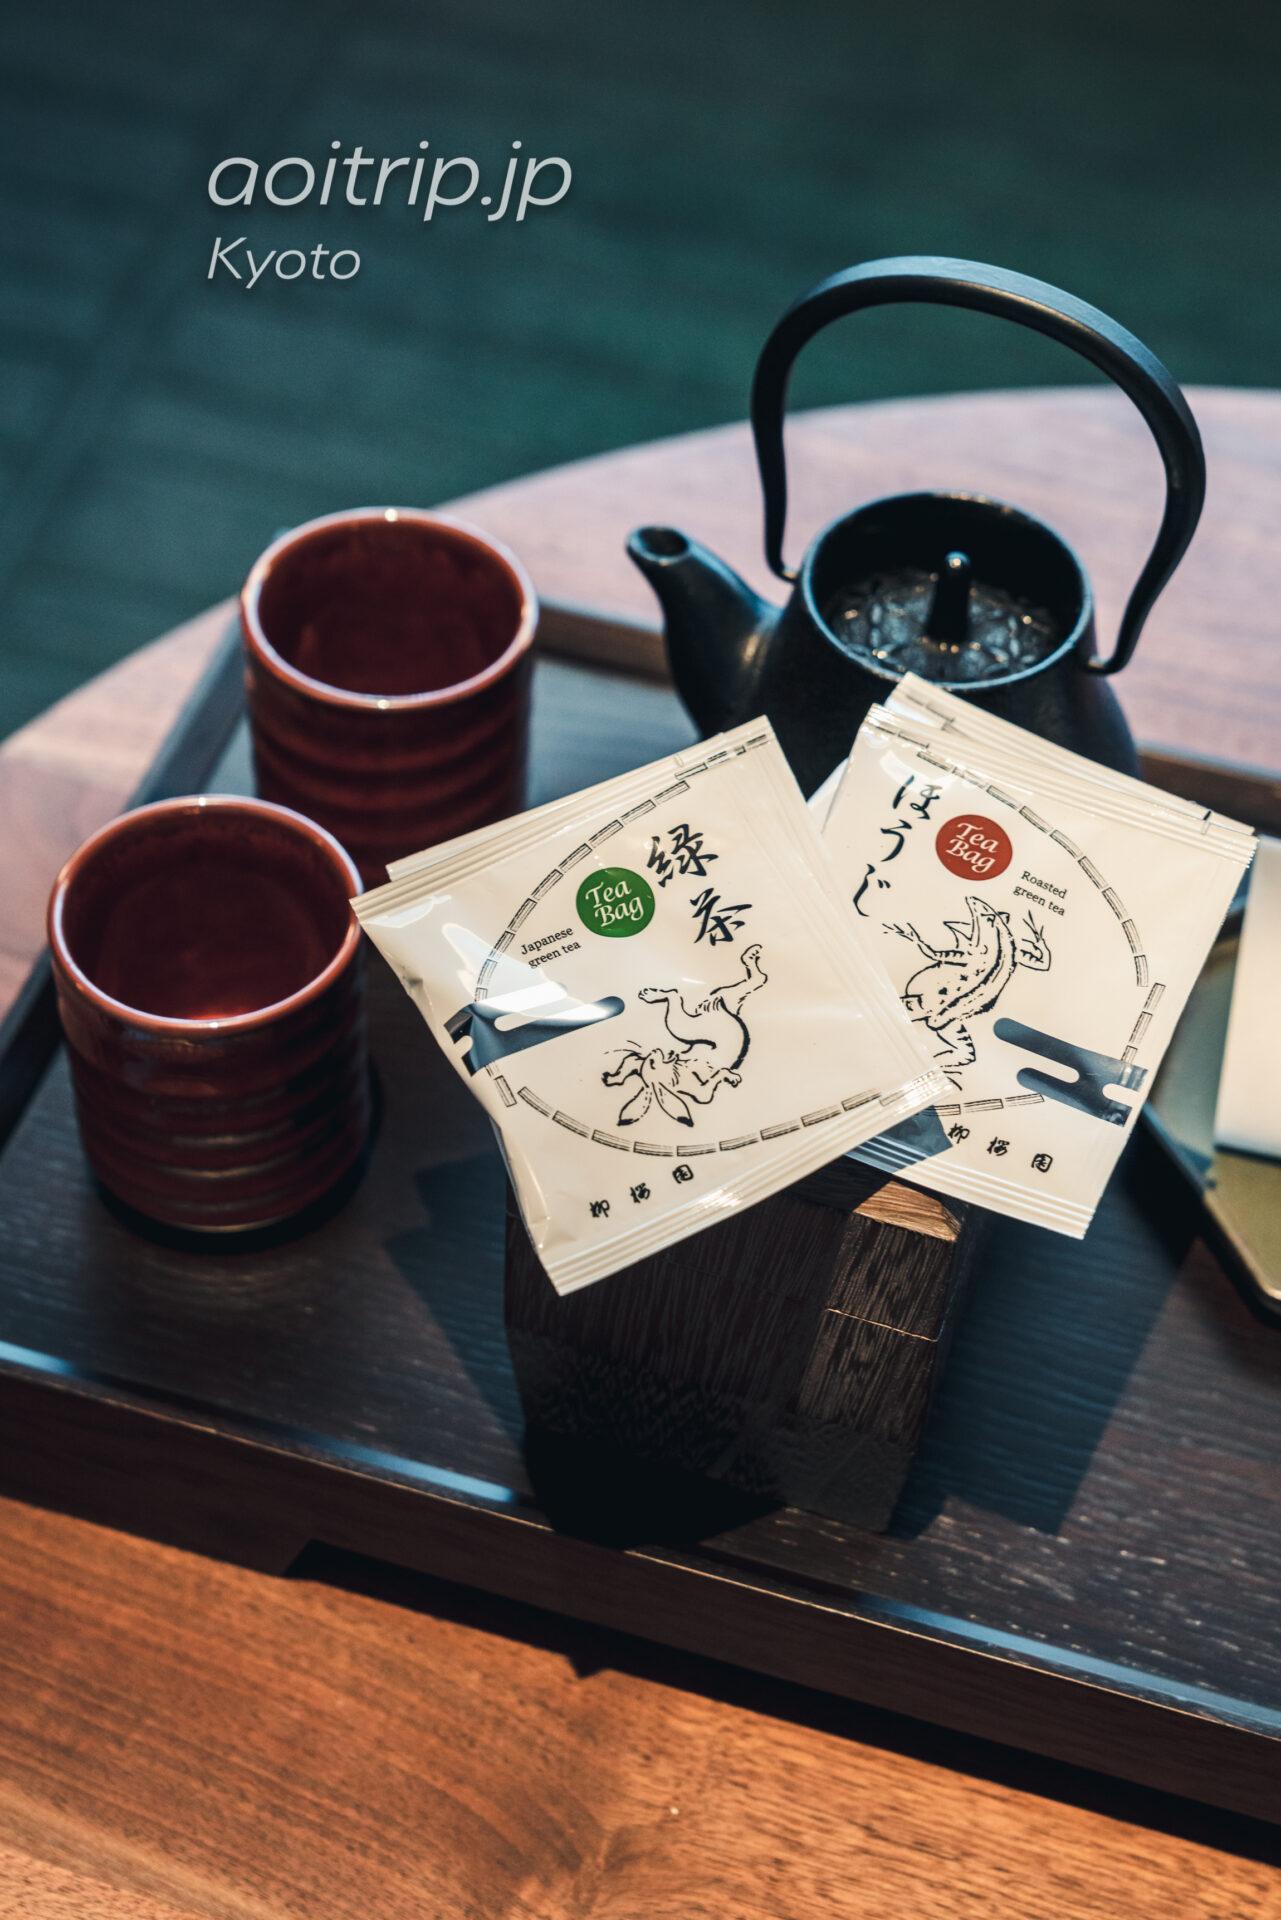 HOTEL THE MITSUI KYOTO チタンエリート特典のウェルカムドリンク 柳桜園茶舗